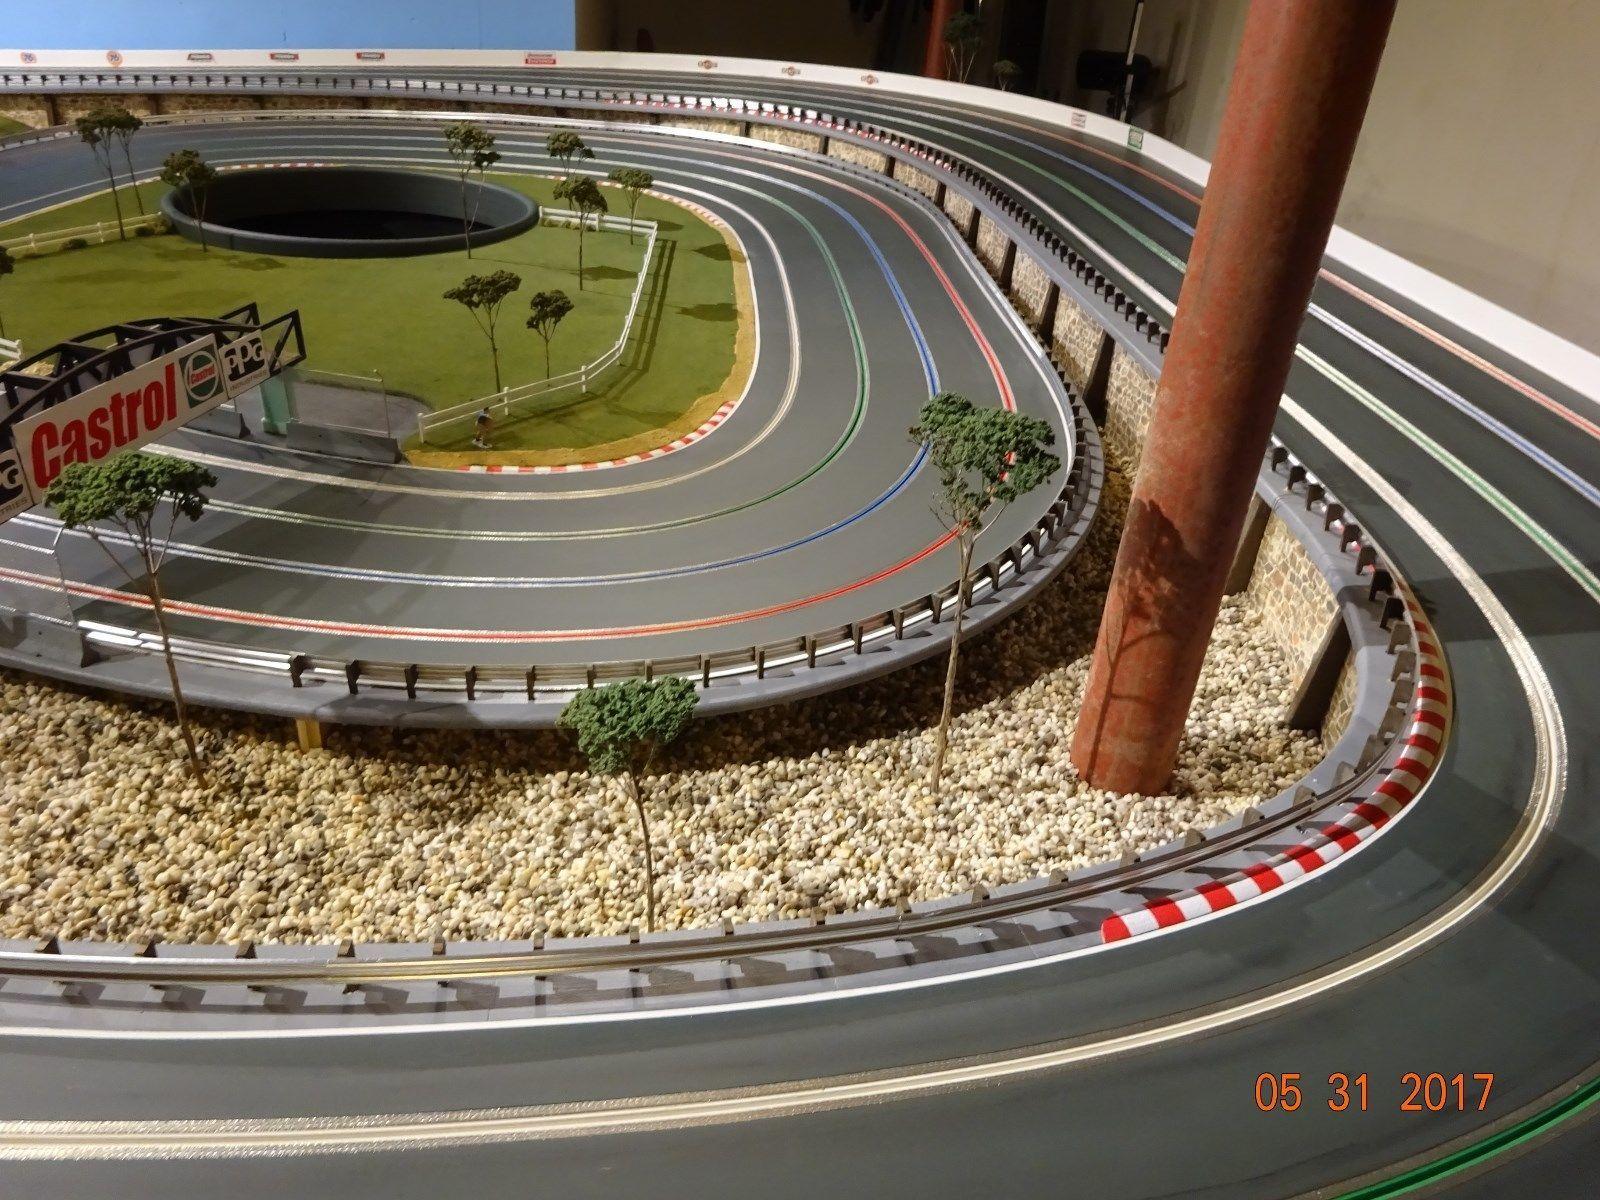 1 32 Scale Aluminum Armco Guardrail System Slot Car Track Diorama Scenery Ebay Slot Cars Slot Car Track Slot